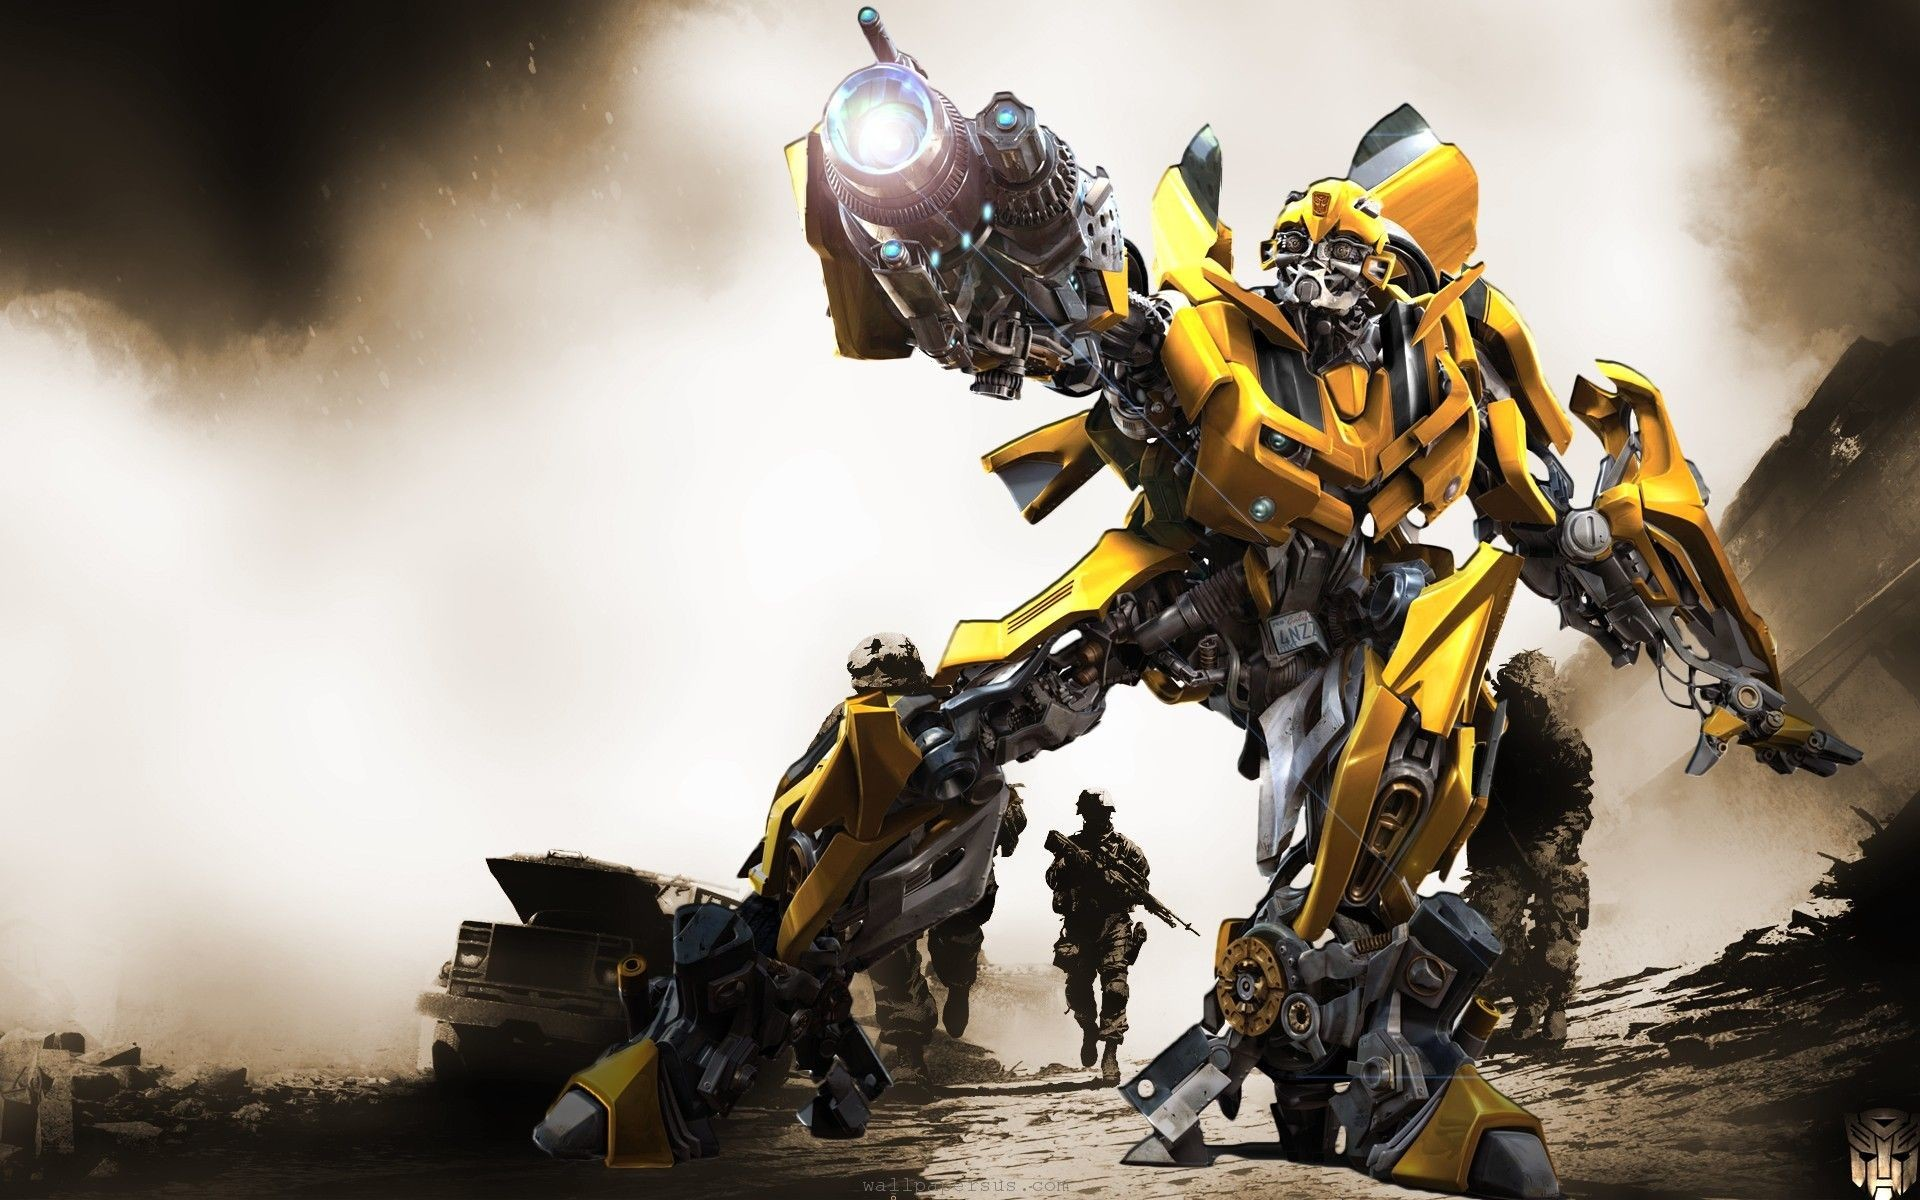 Res: 1920x1200, Transformers Bumblebee Wallpaper Transformers Movies 640×1136 Transformer Bumblebee  Wallpapers (44 Wallpapers) |